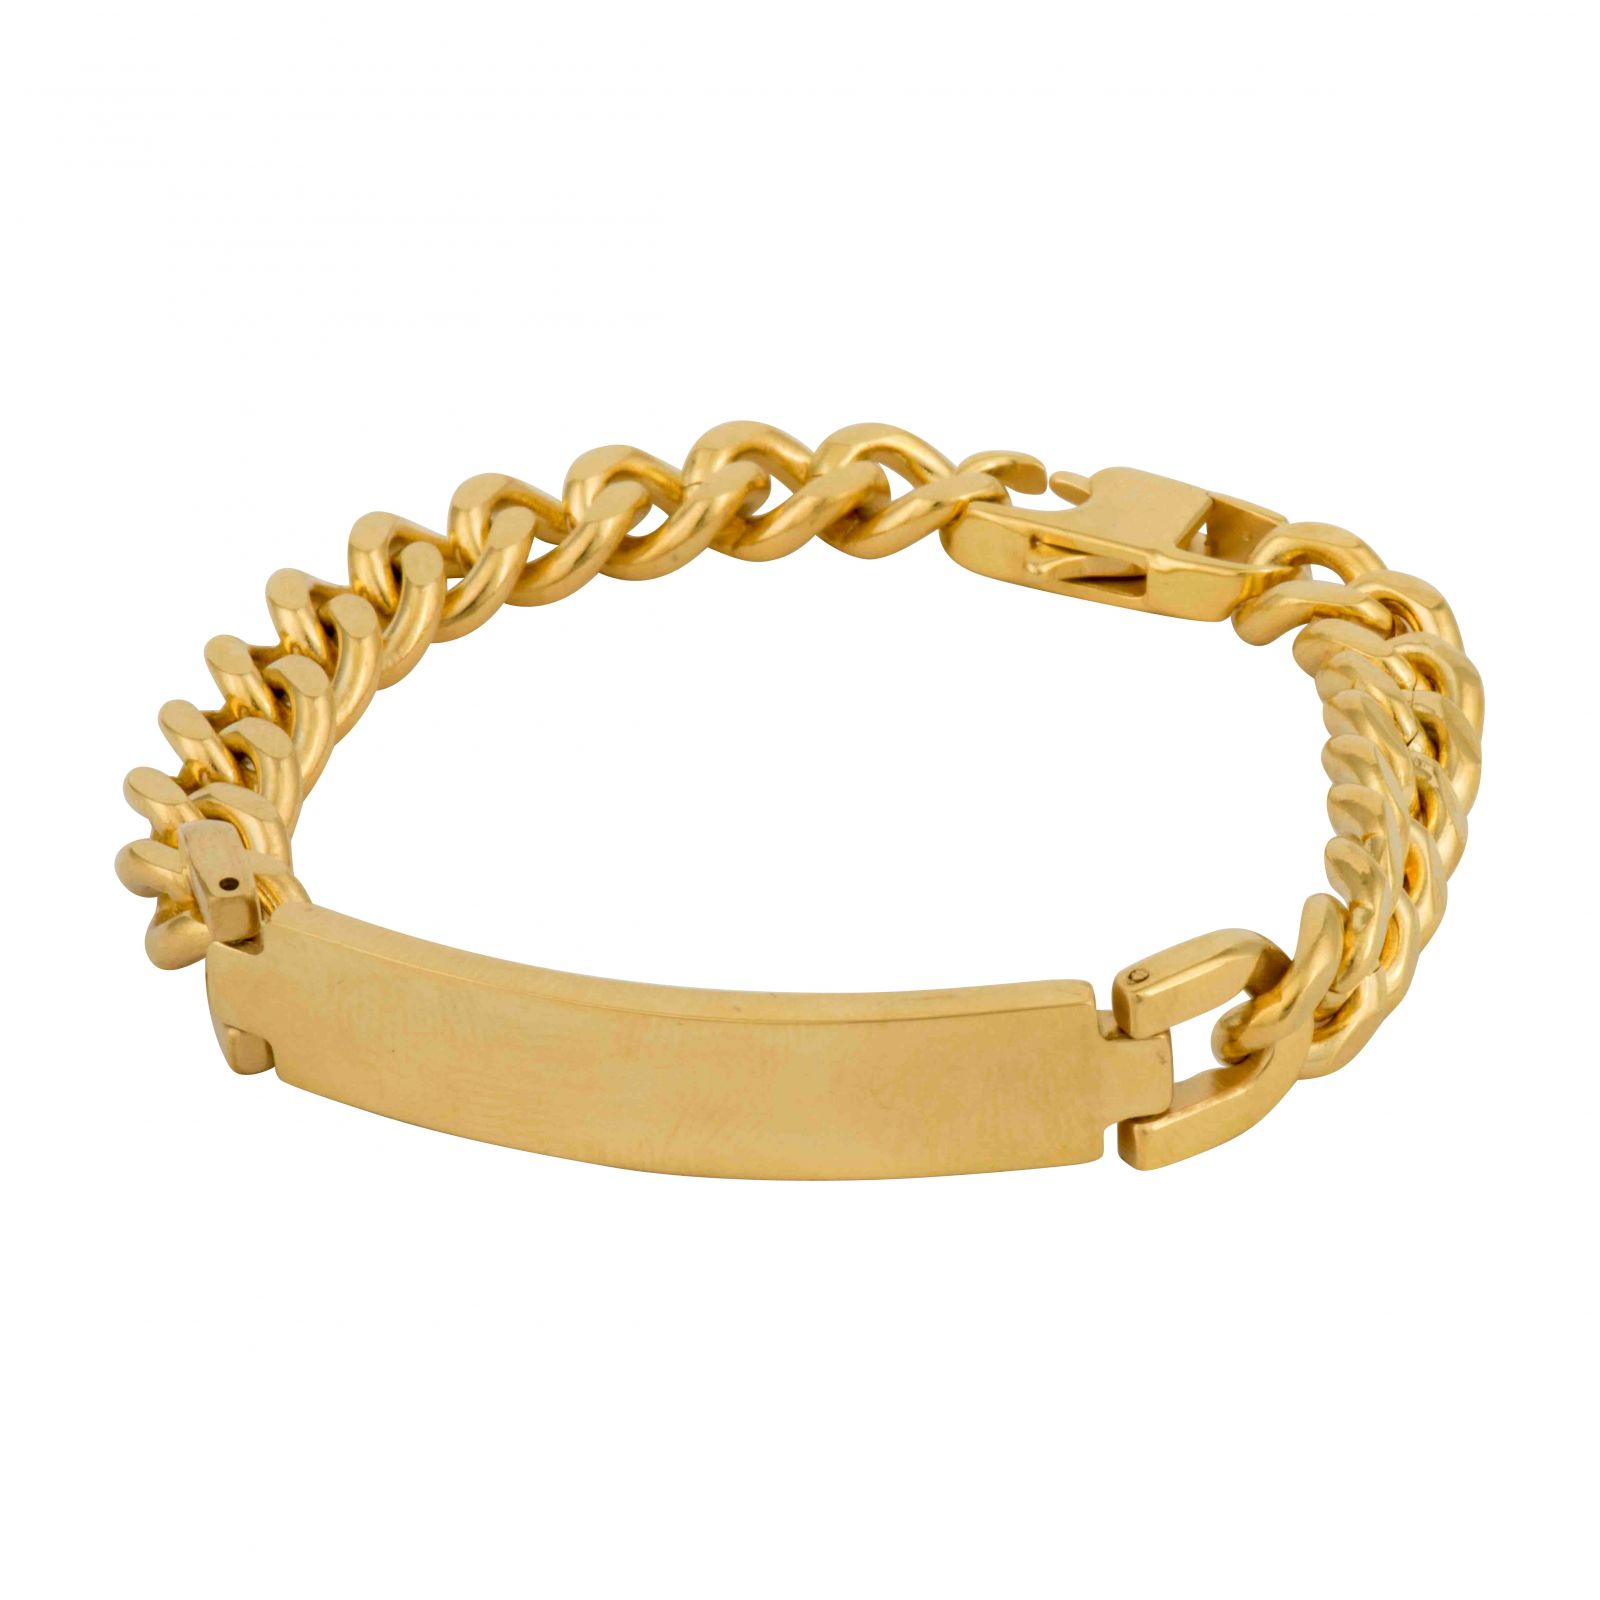 Men's ID Bracelet - Colour Plated Finish.